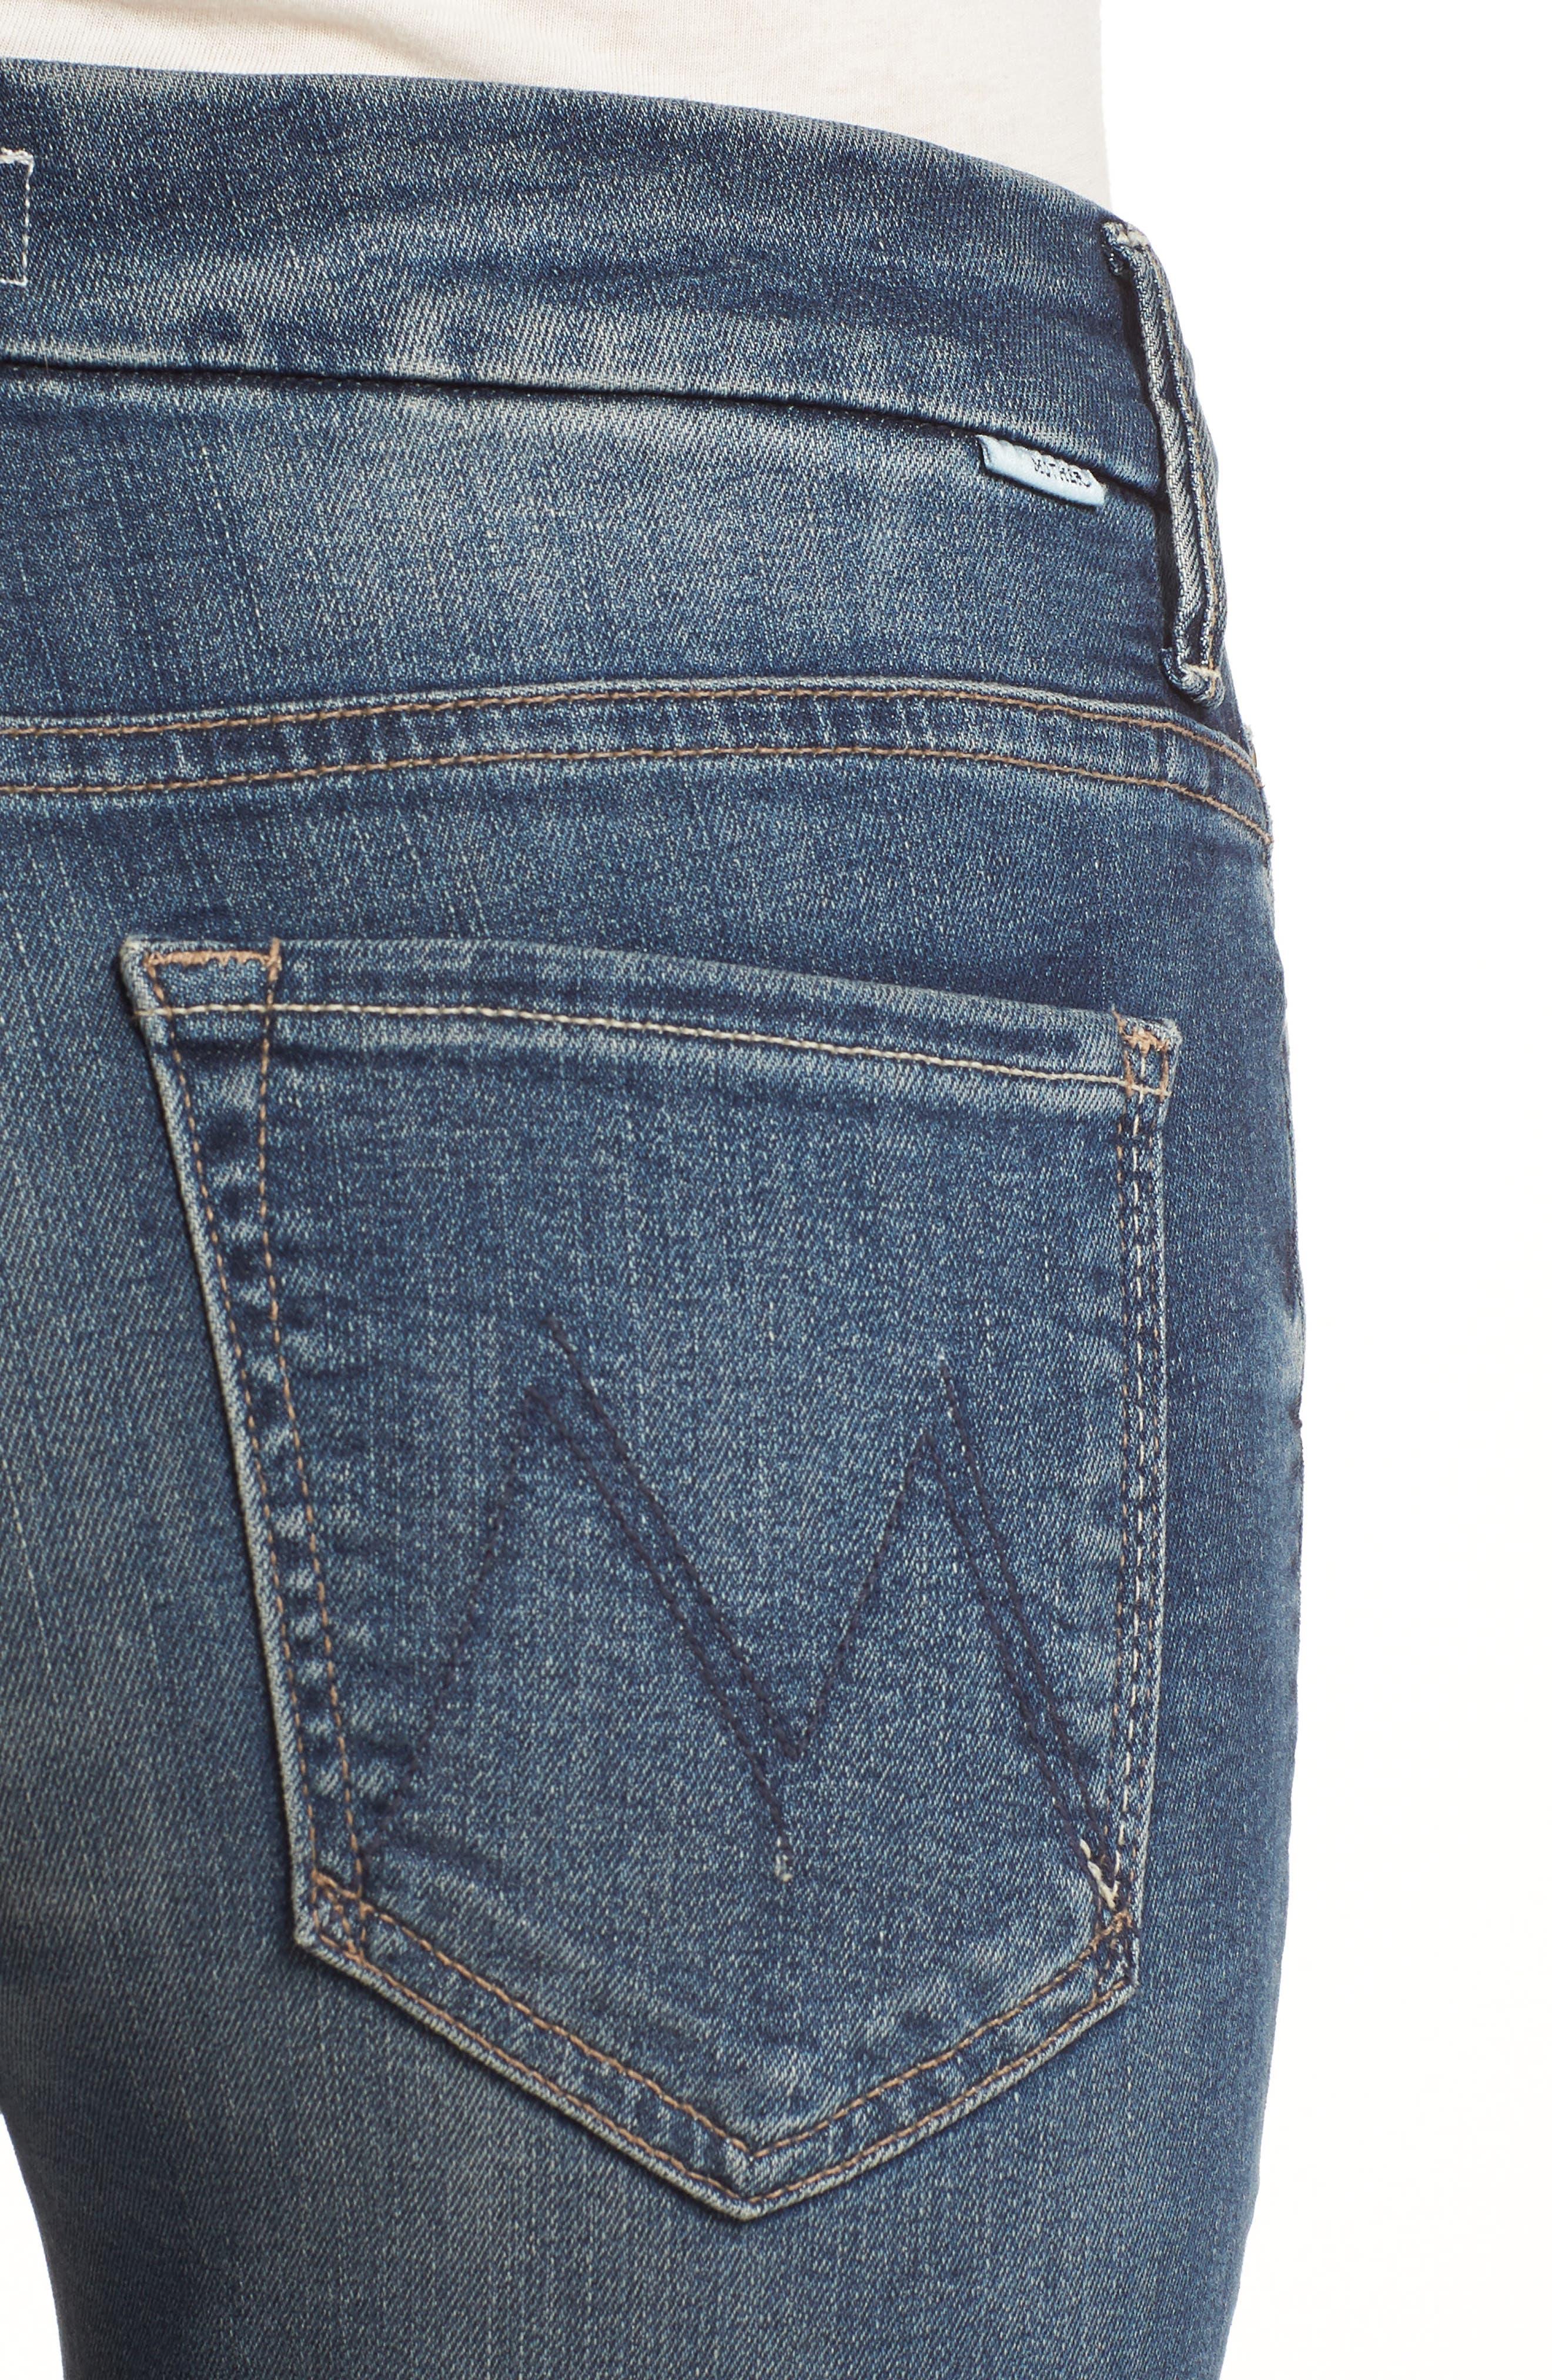 The Looker High Waist Crop Skinny Jeans,                             Alternate thumbnail 4, color,                             Bake Sale Brawl